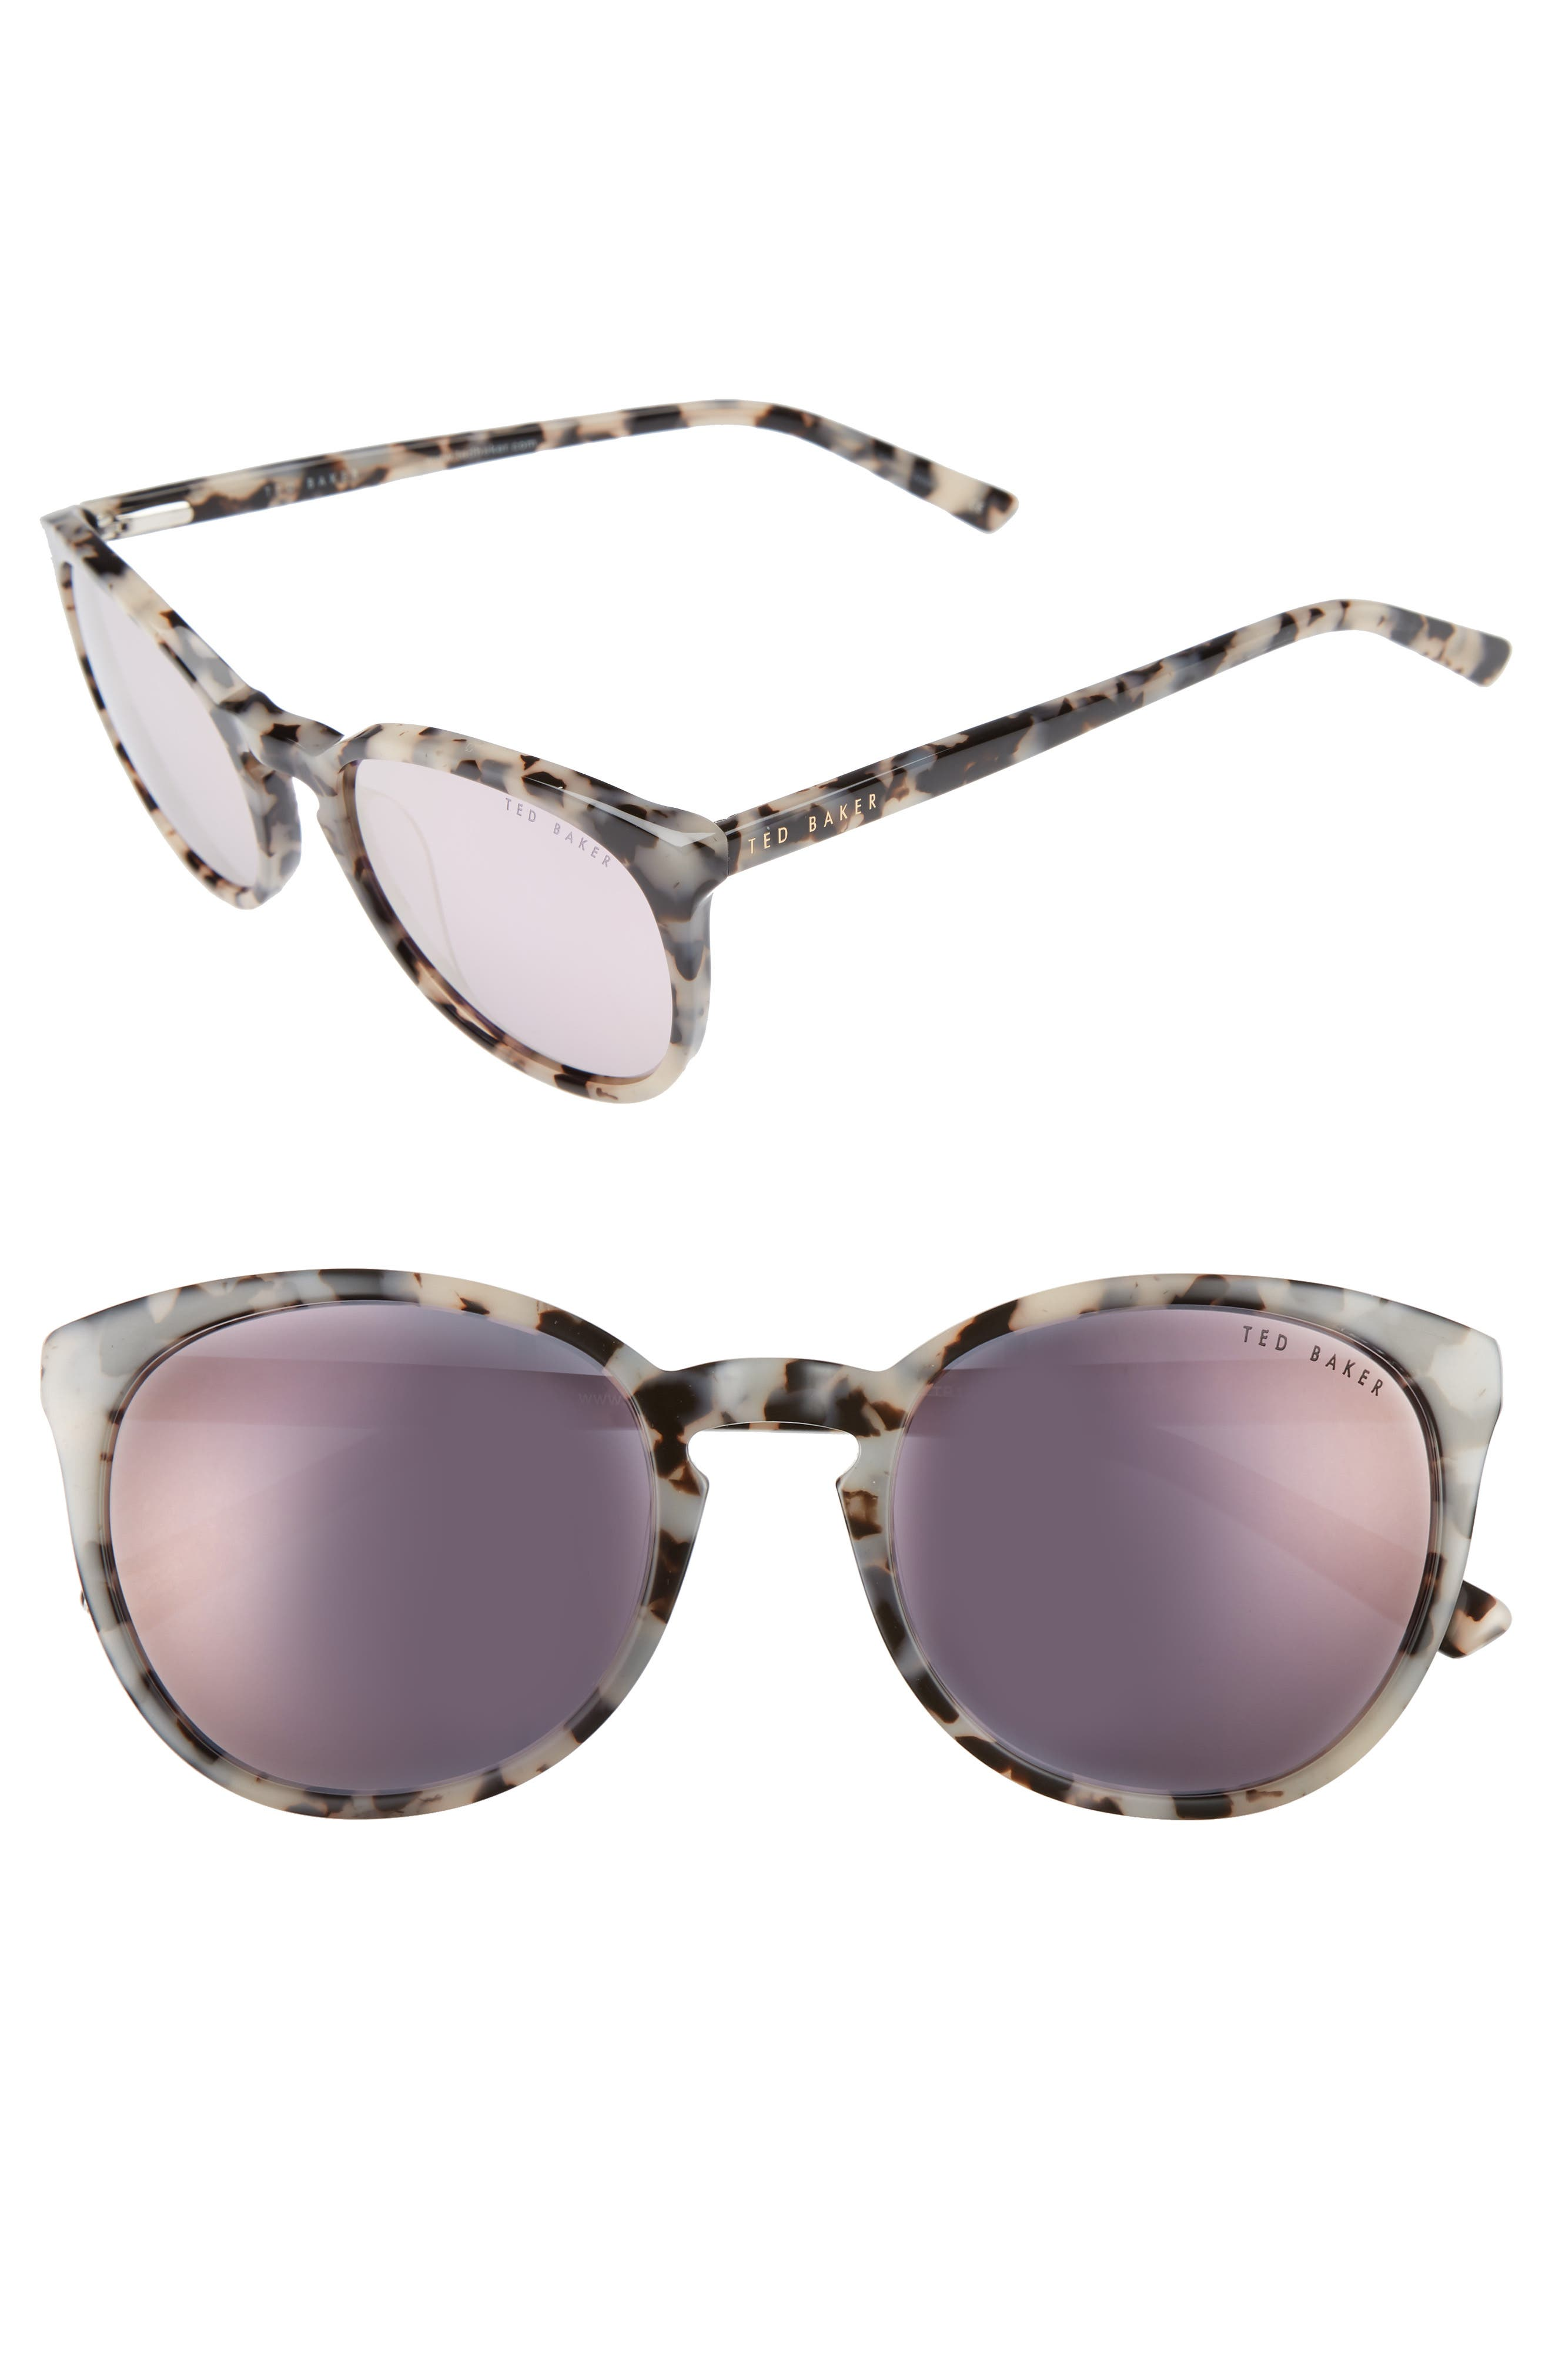 53mm Round Sunglasses,                             Main thumbnail 1, color,